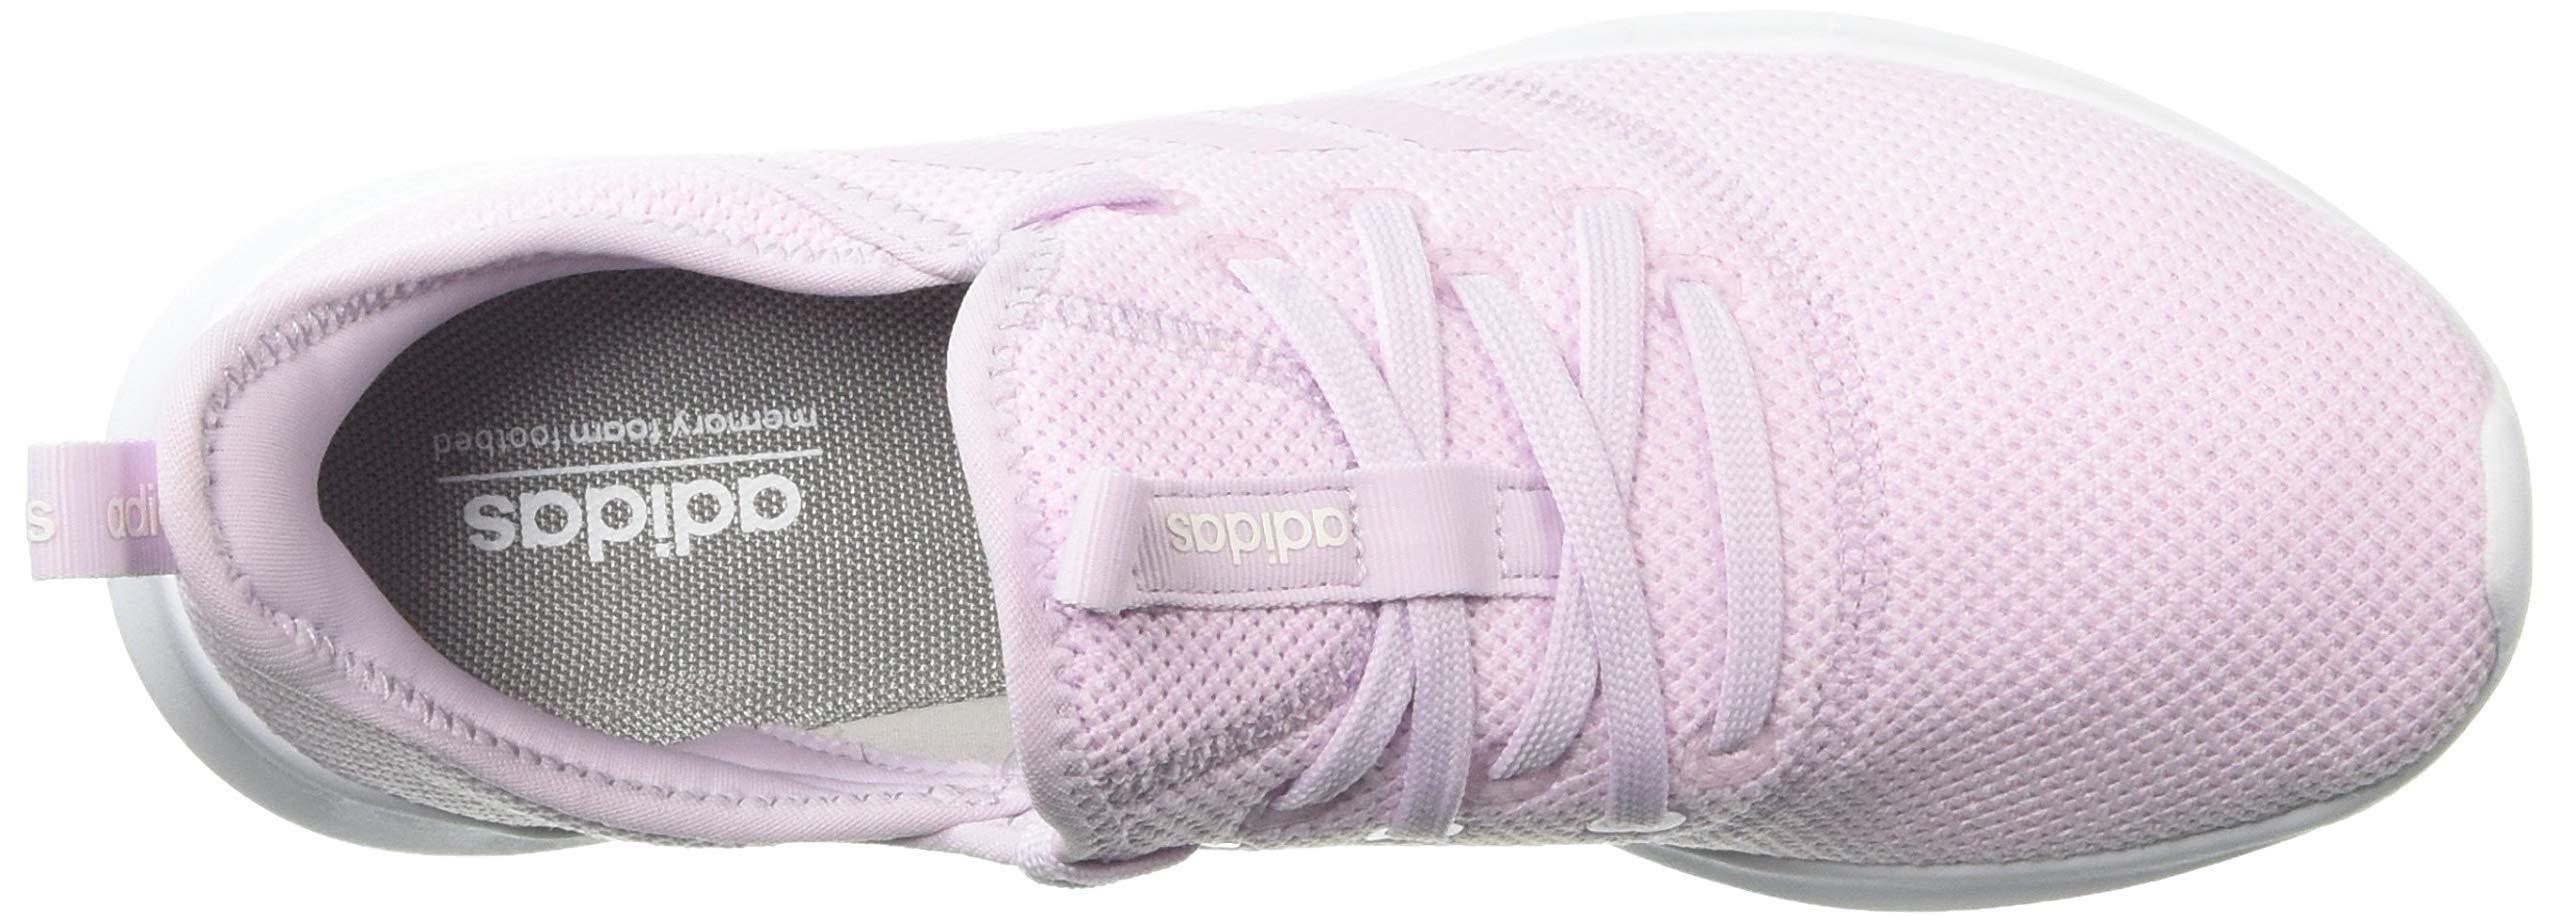 adidas Women's Cloudfoam Pure, aero Pink/White, 5.5 M US by adidas (Image #7)